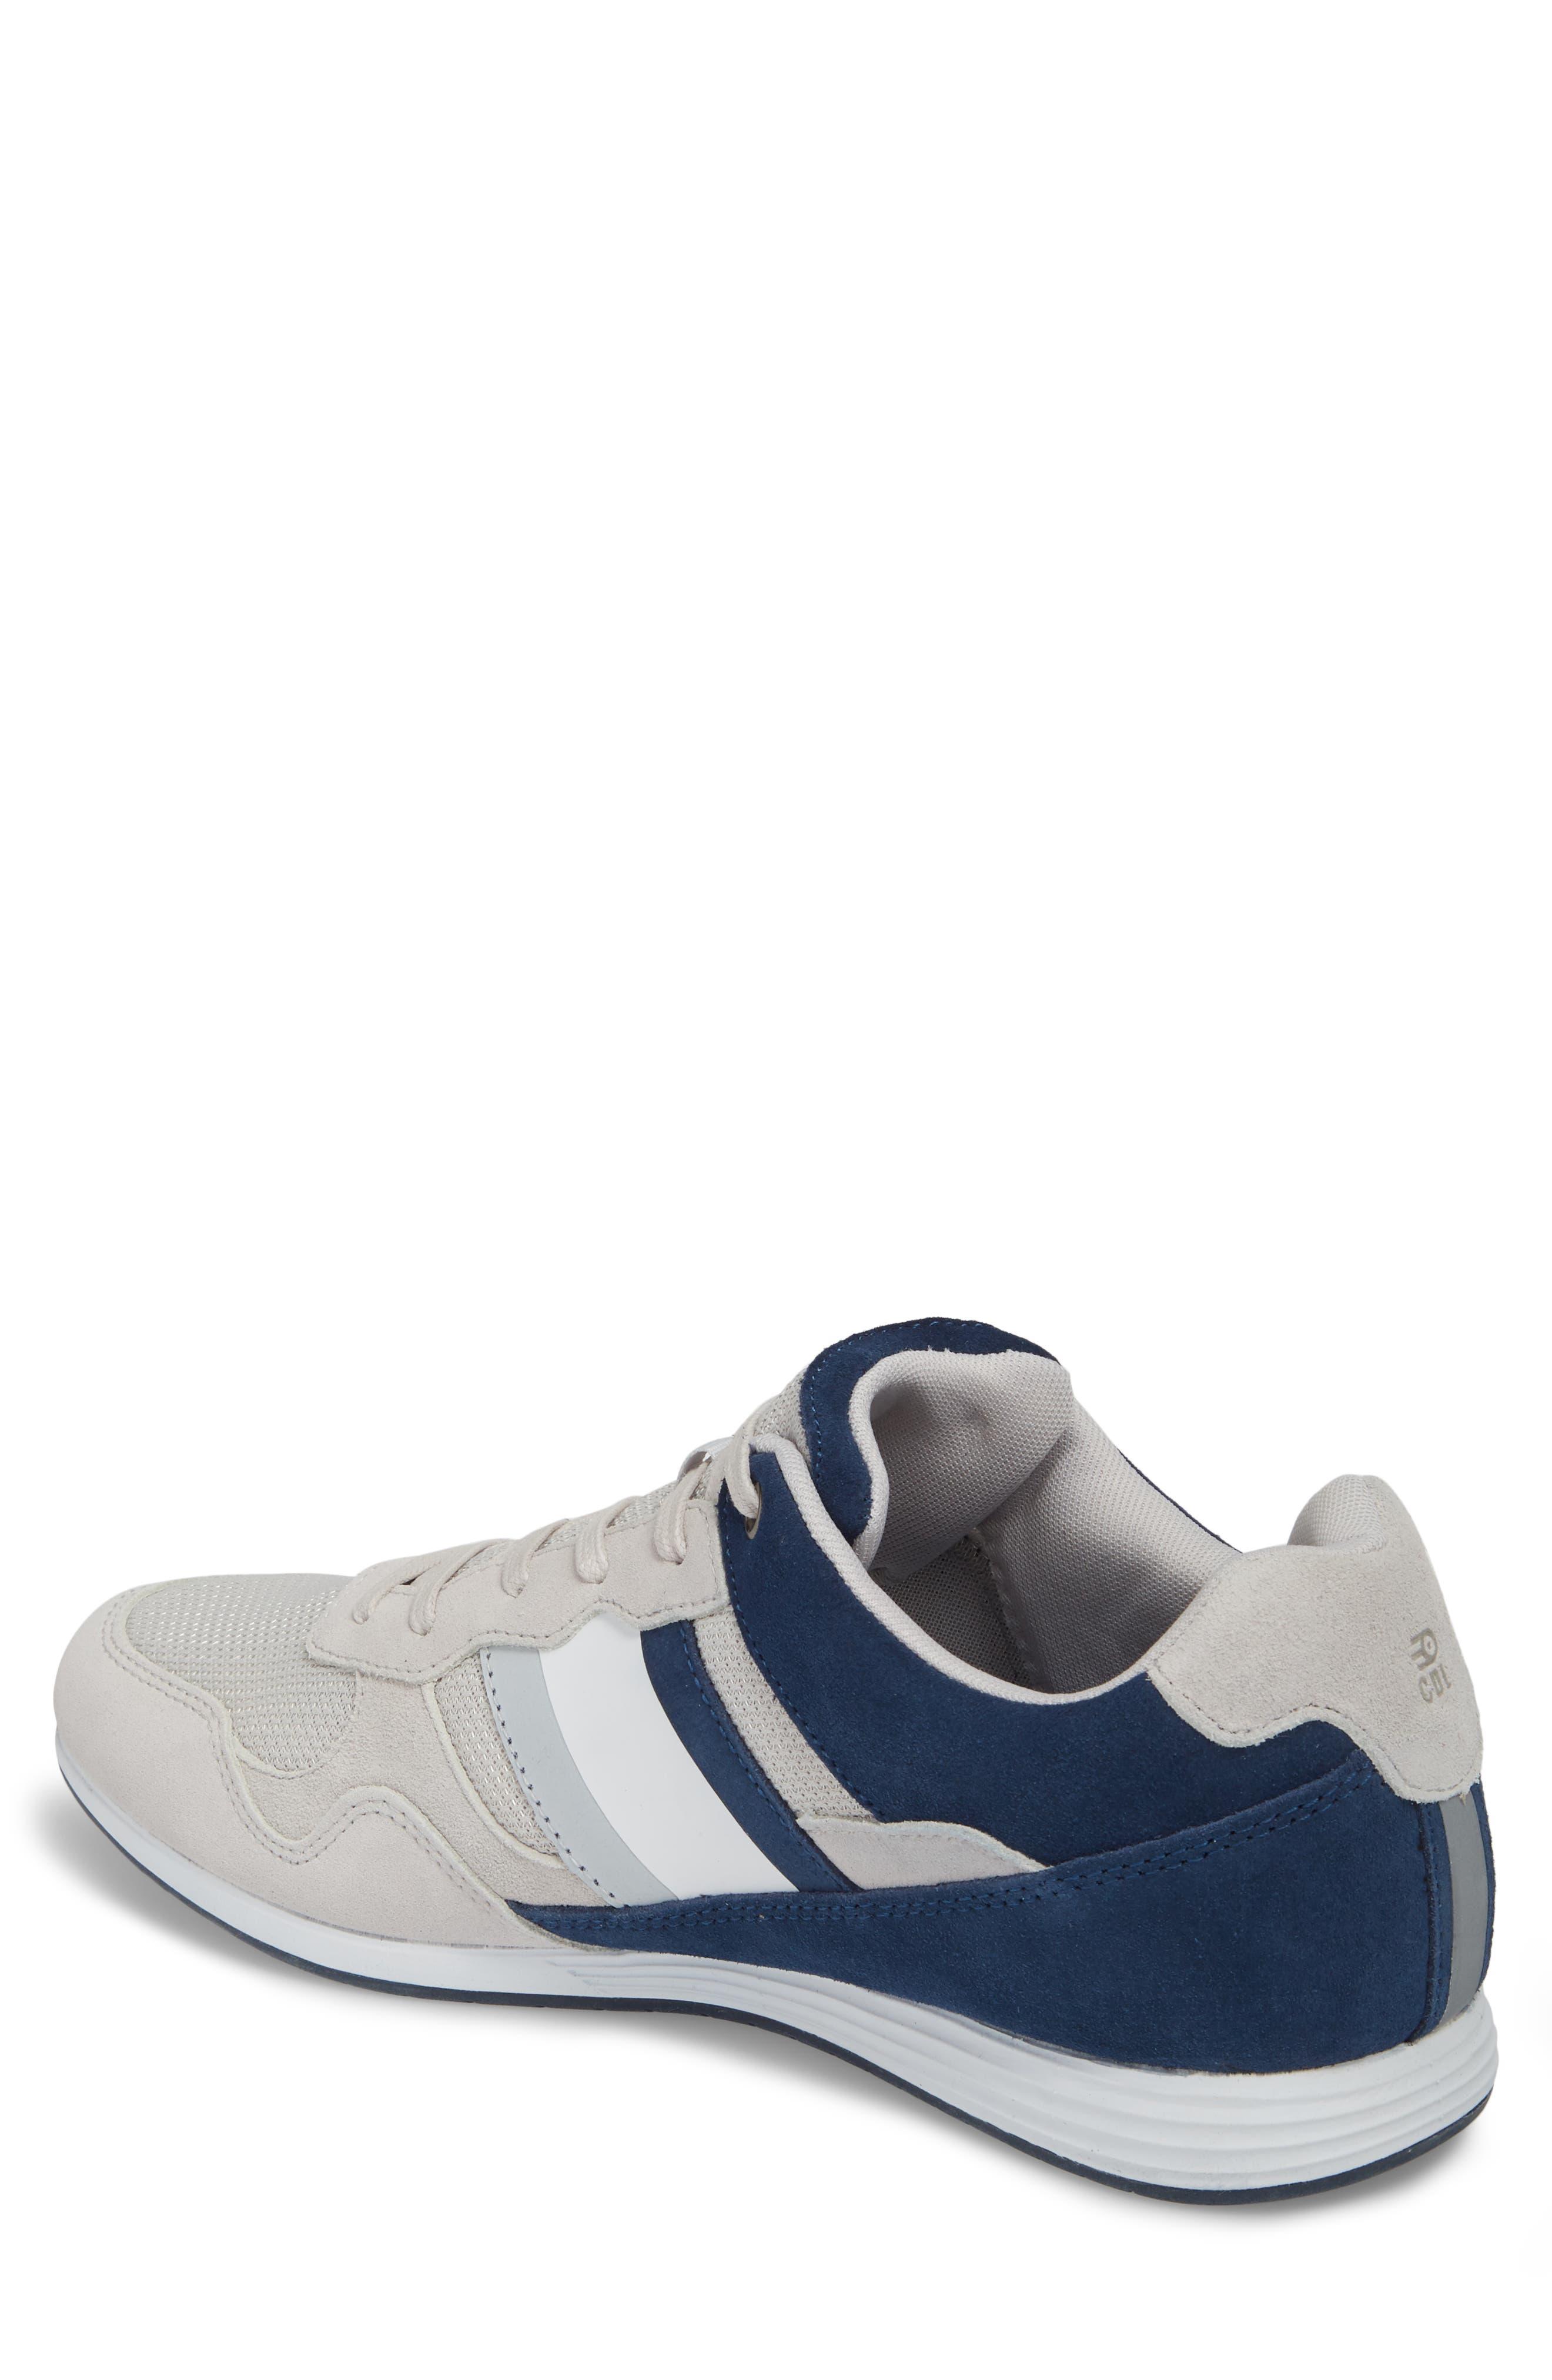 Scarpo Low Top Sneaker,                             Alternate thumbnail 2, color,                             020